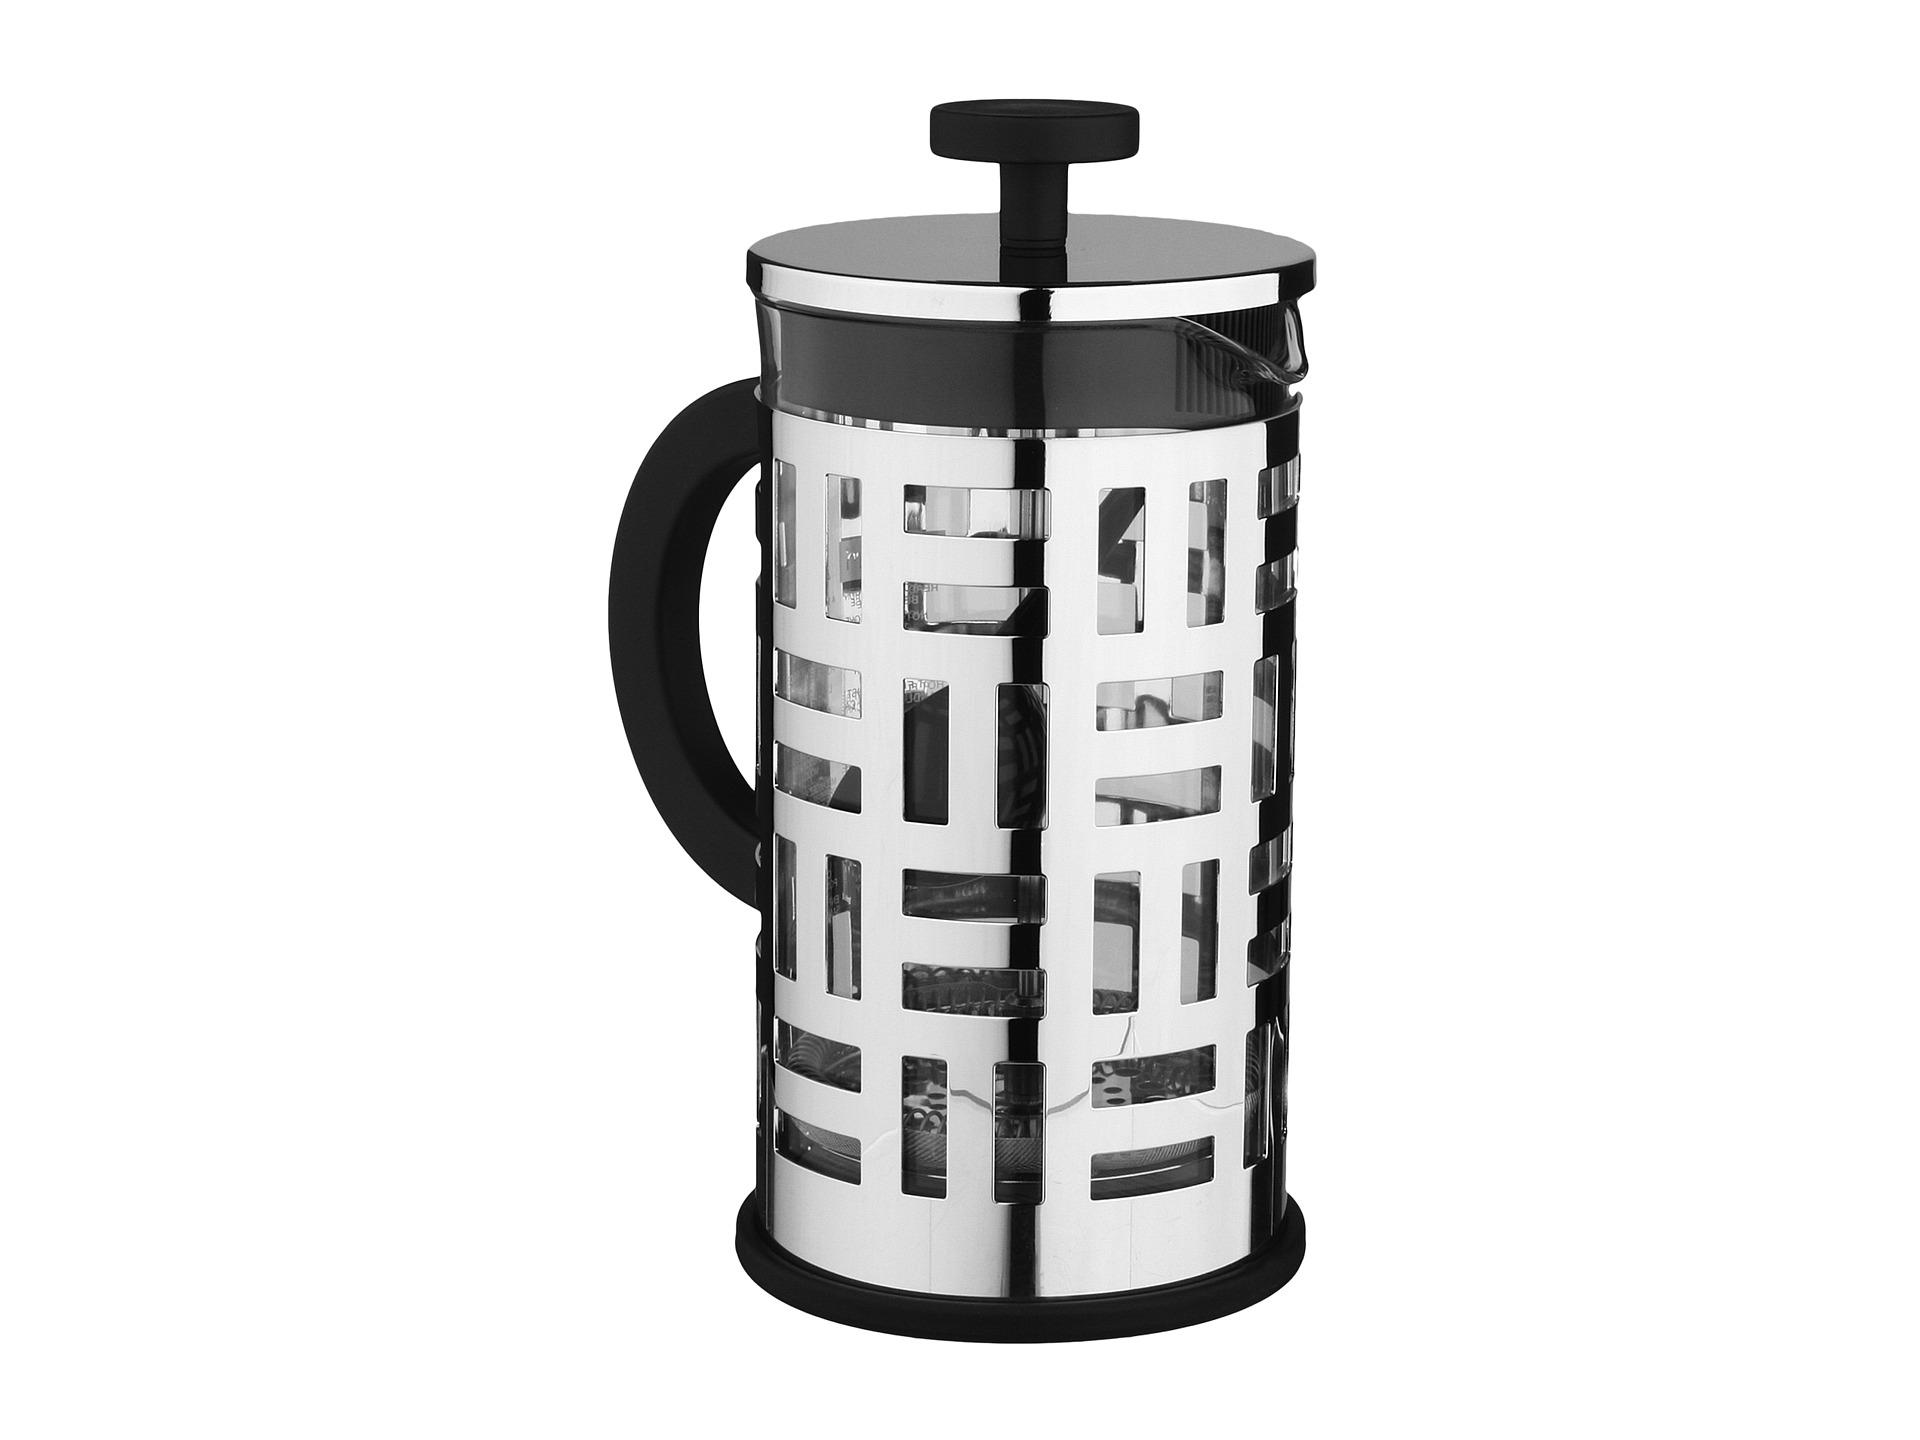 Free French Press Coffee Maker : Bodum Eileen 8 Cup French Press Coffee Maker Shipped Free at Zappos